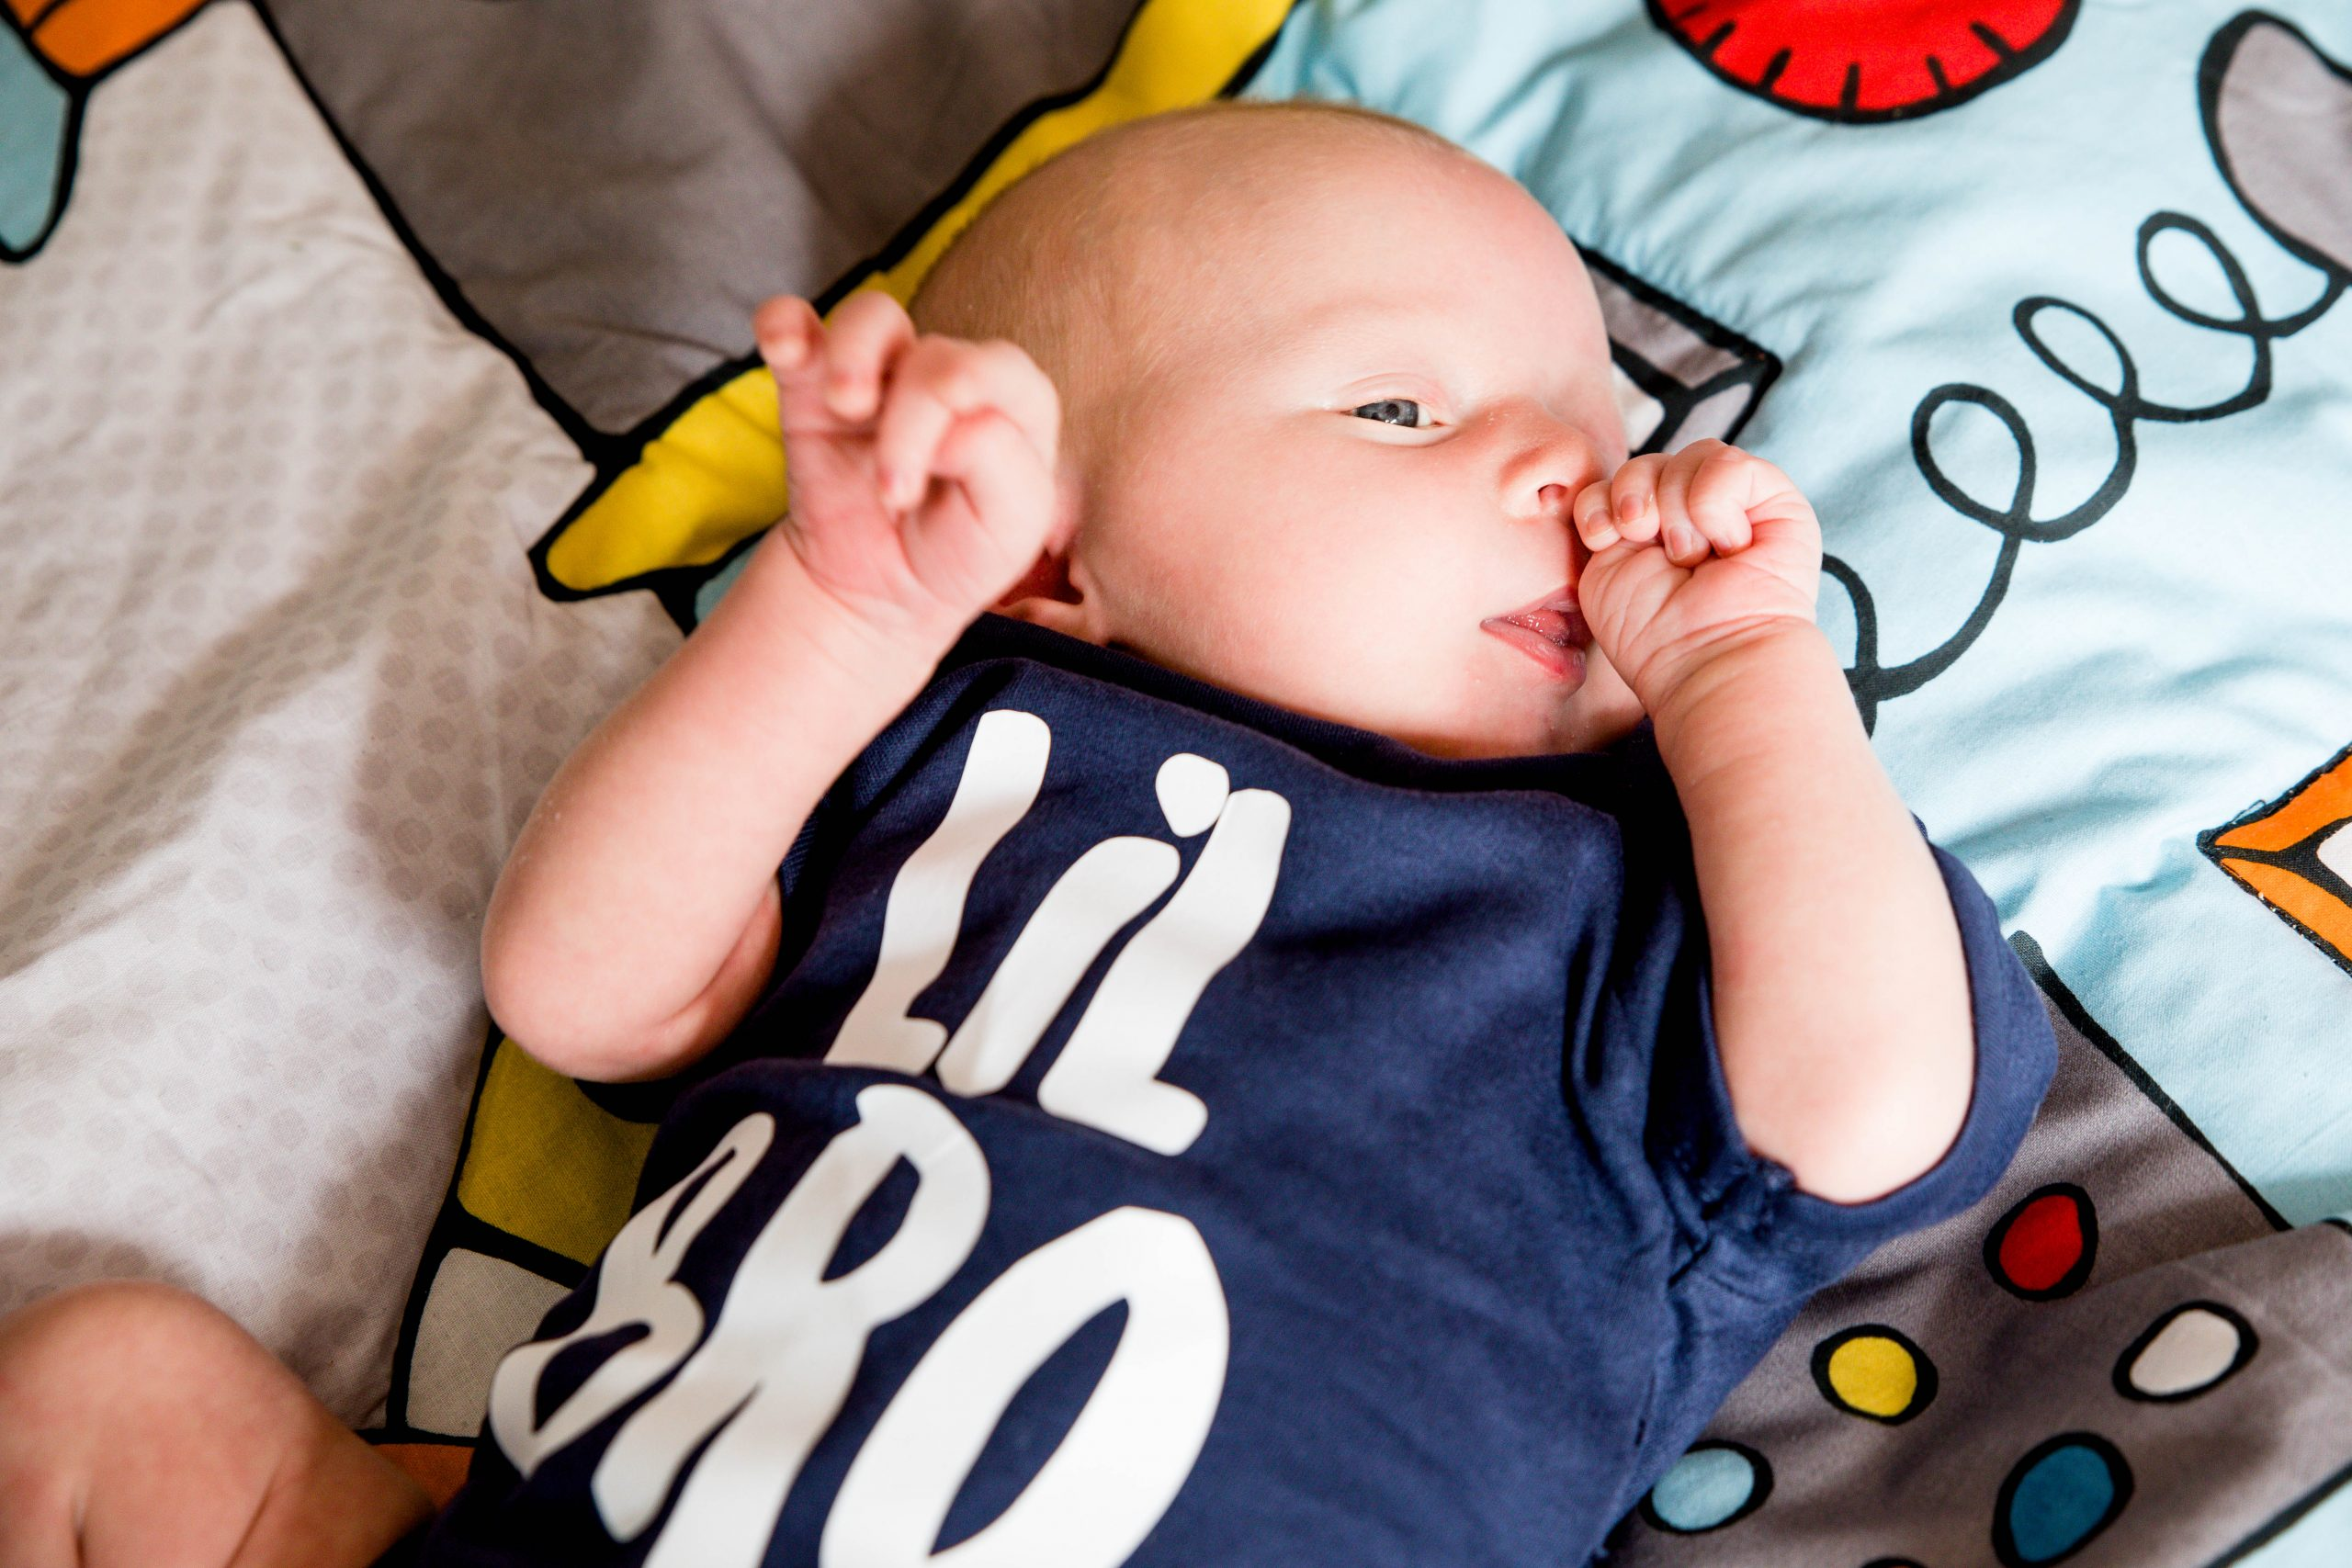 newborn baby with lil bro babygro